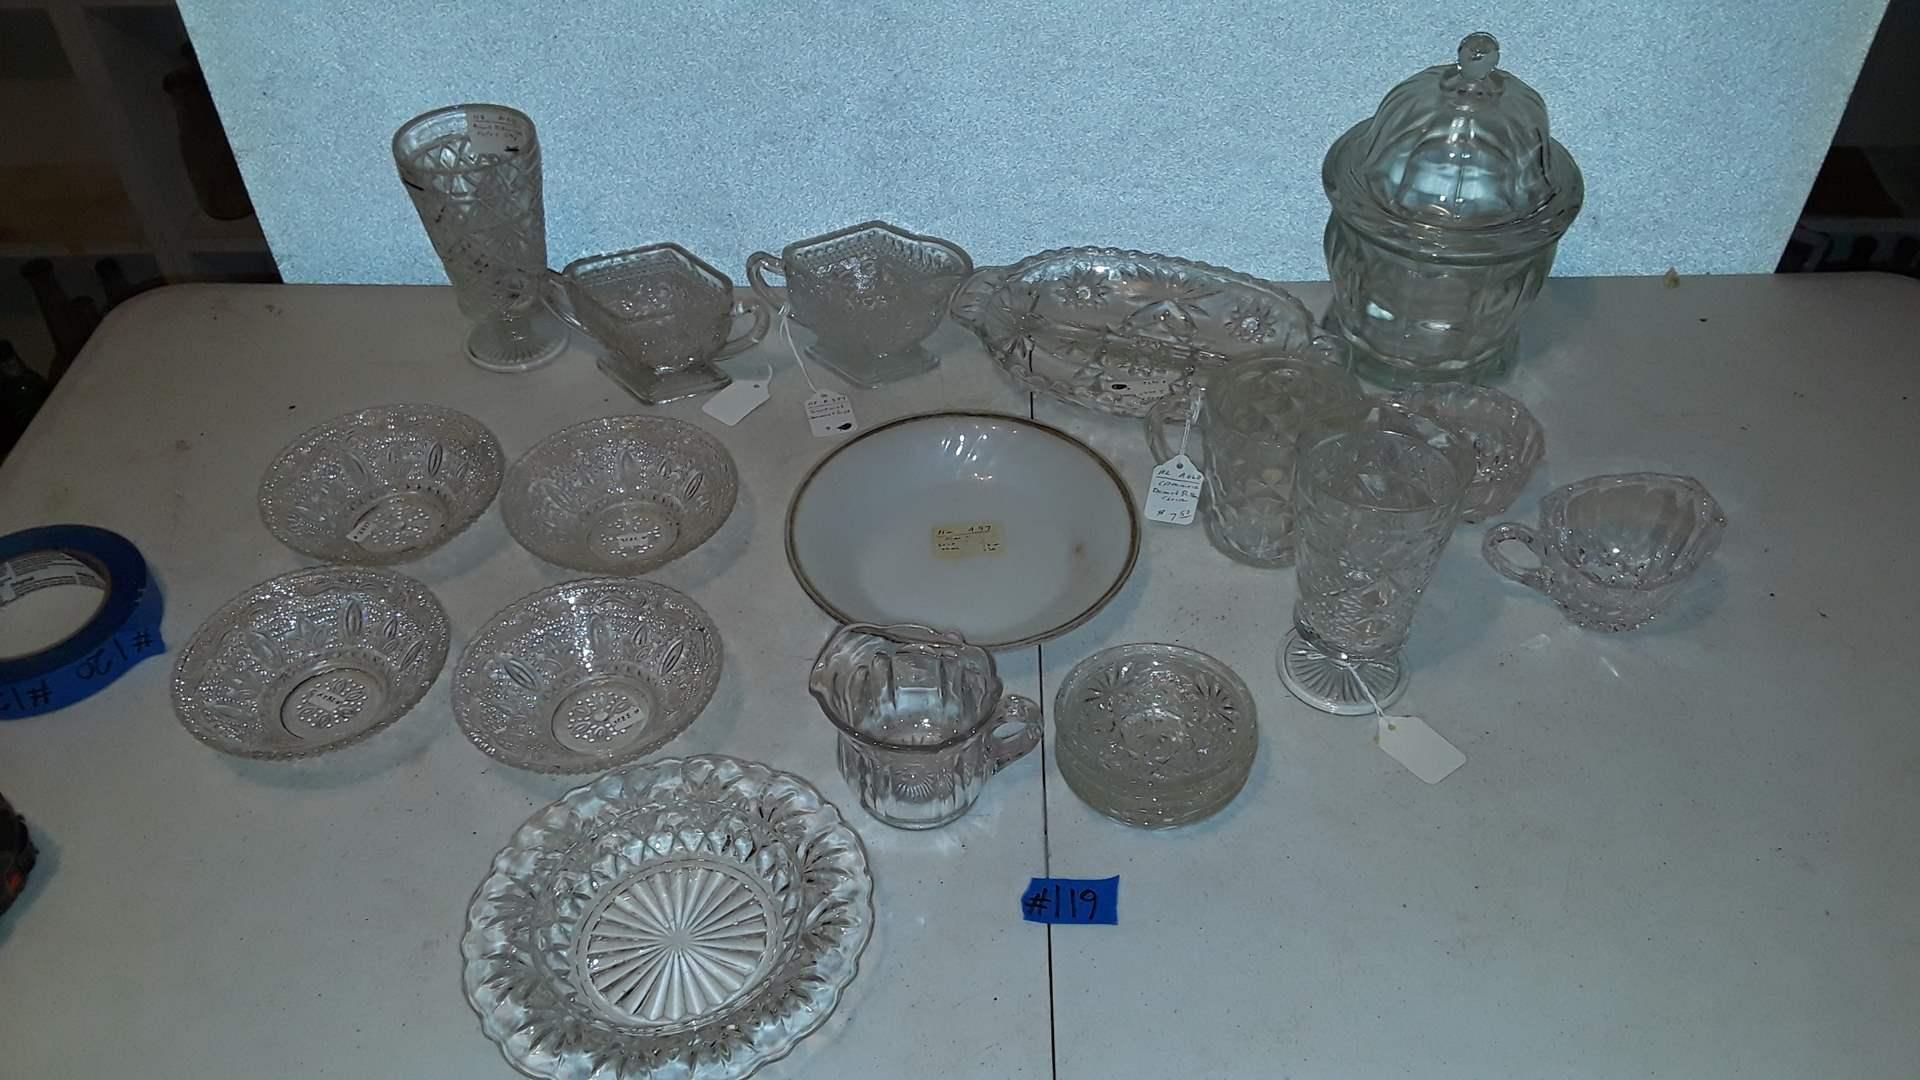 Lot # 119 ANTIQUE CLEAR GLASSWARE